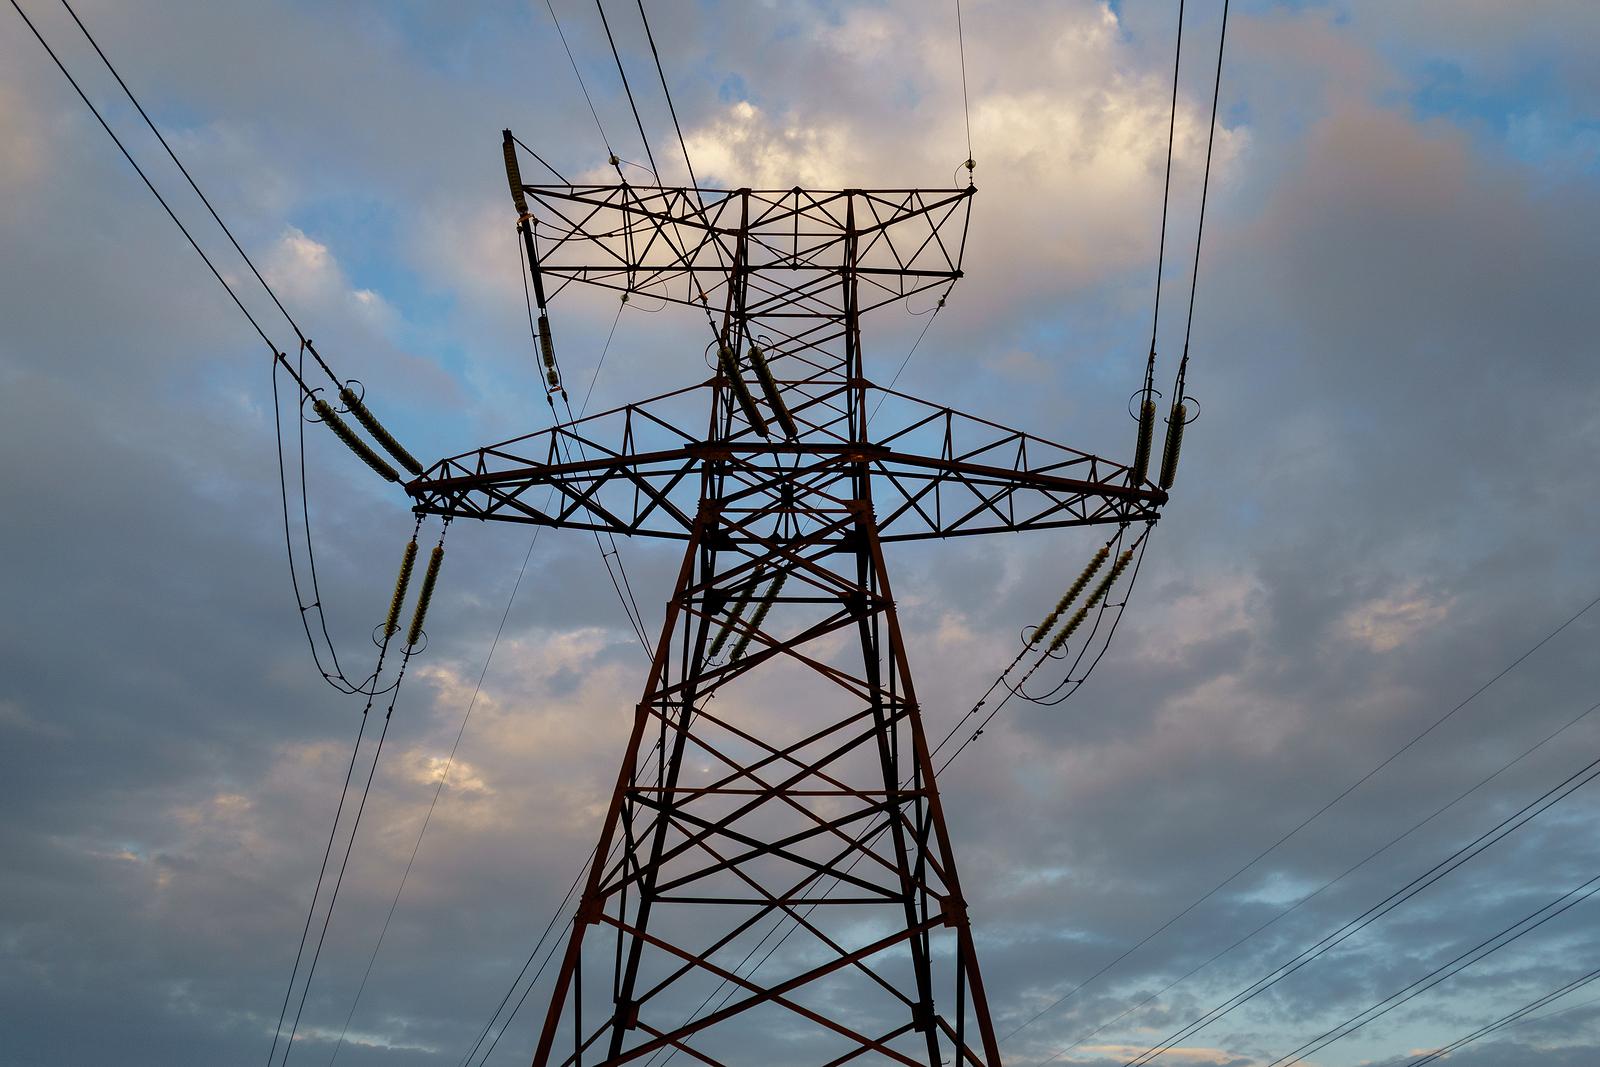 bigstock-High-Power-Electricity-Poles-I-261805414 - Emerging Europe